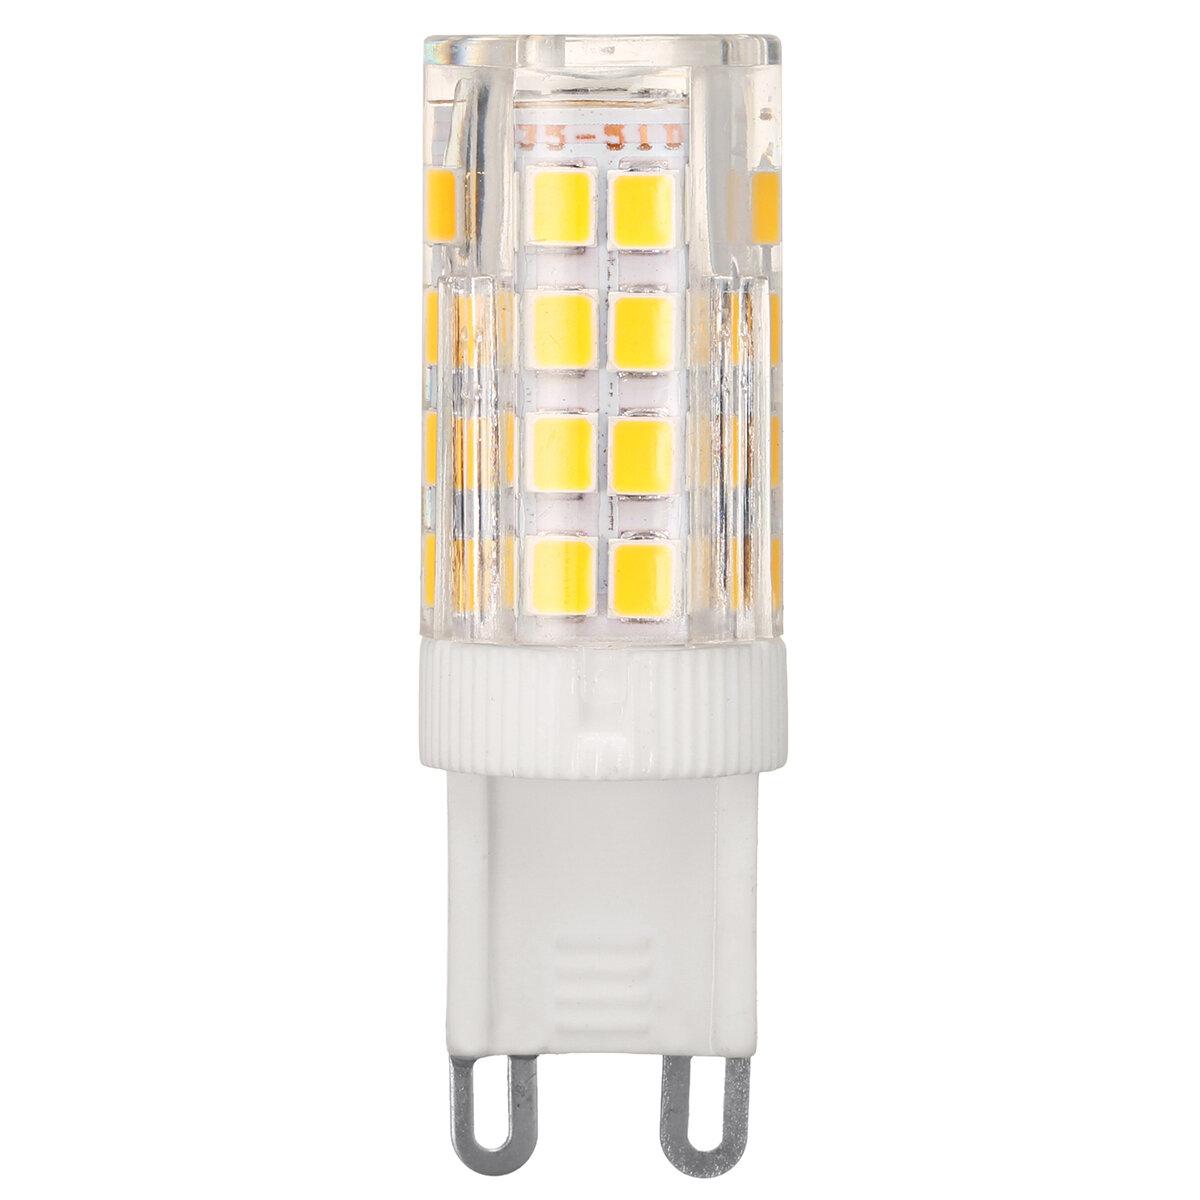 Dimmable G9 2.5W 14 SMD 2835 LED Pure White Warm White Natural White Light Lamp Bulb AC110V/AC220V - 4